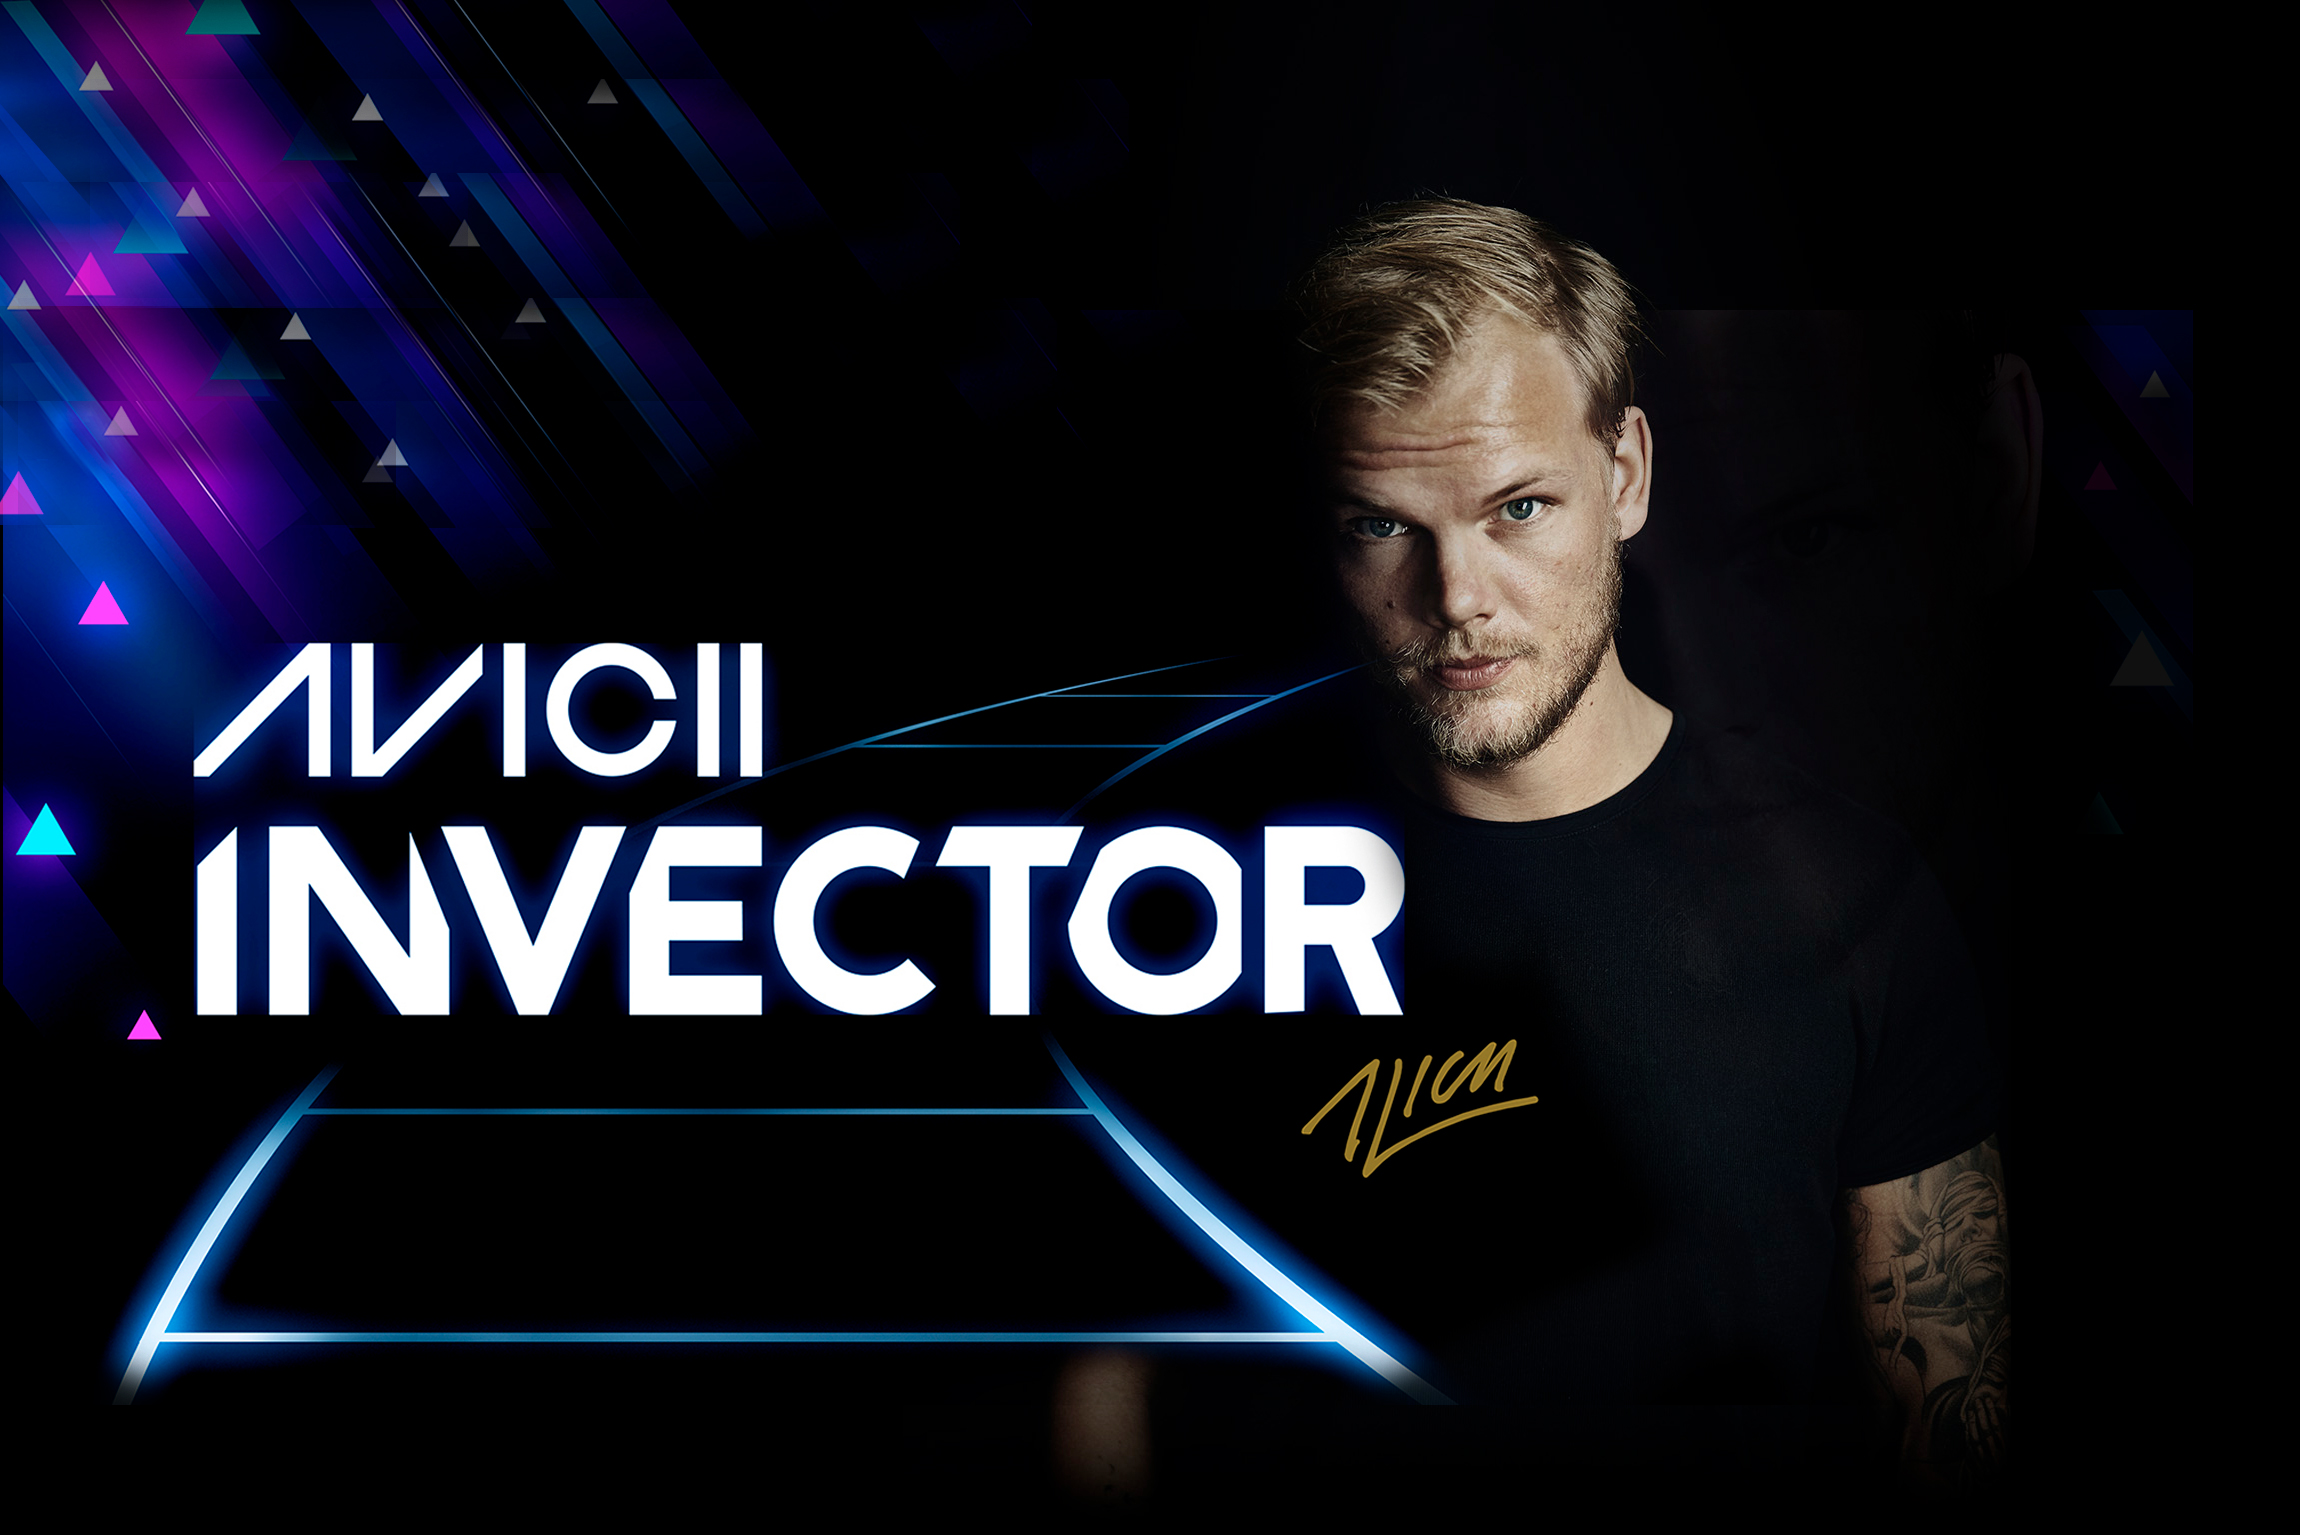 Avicii Invector jogos musica eletronica